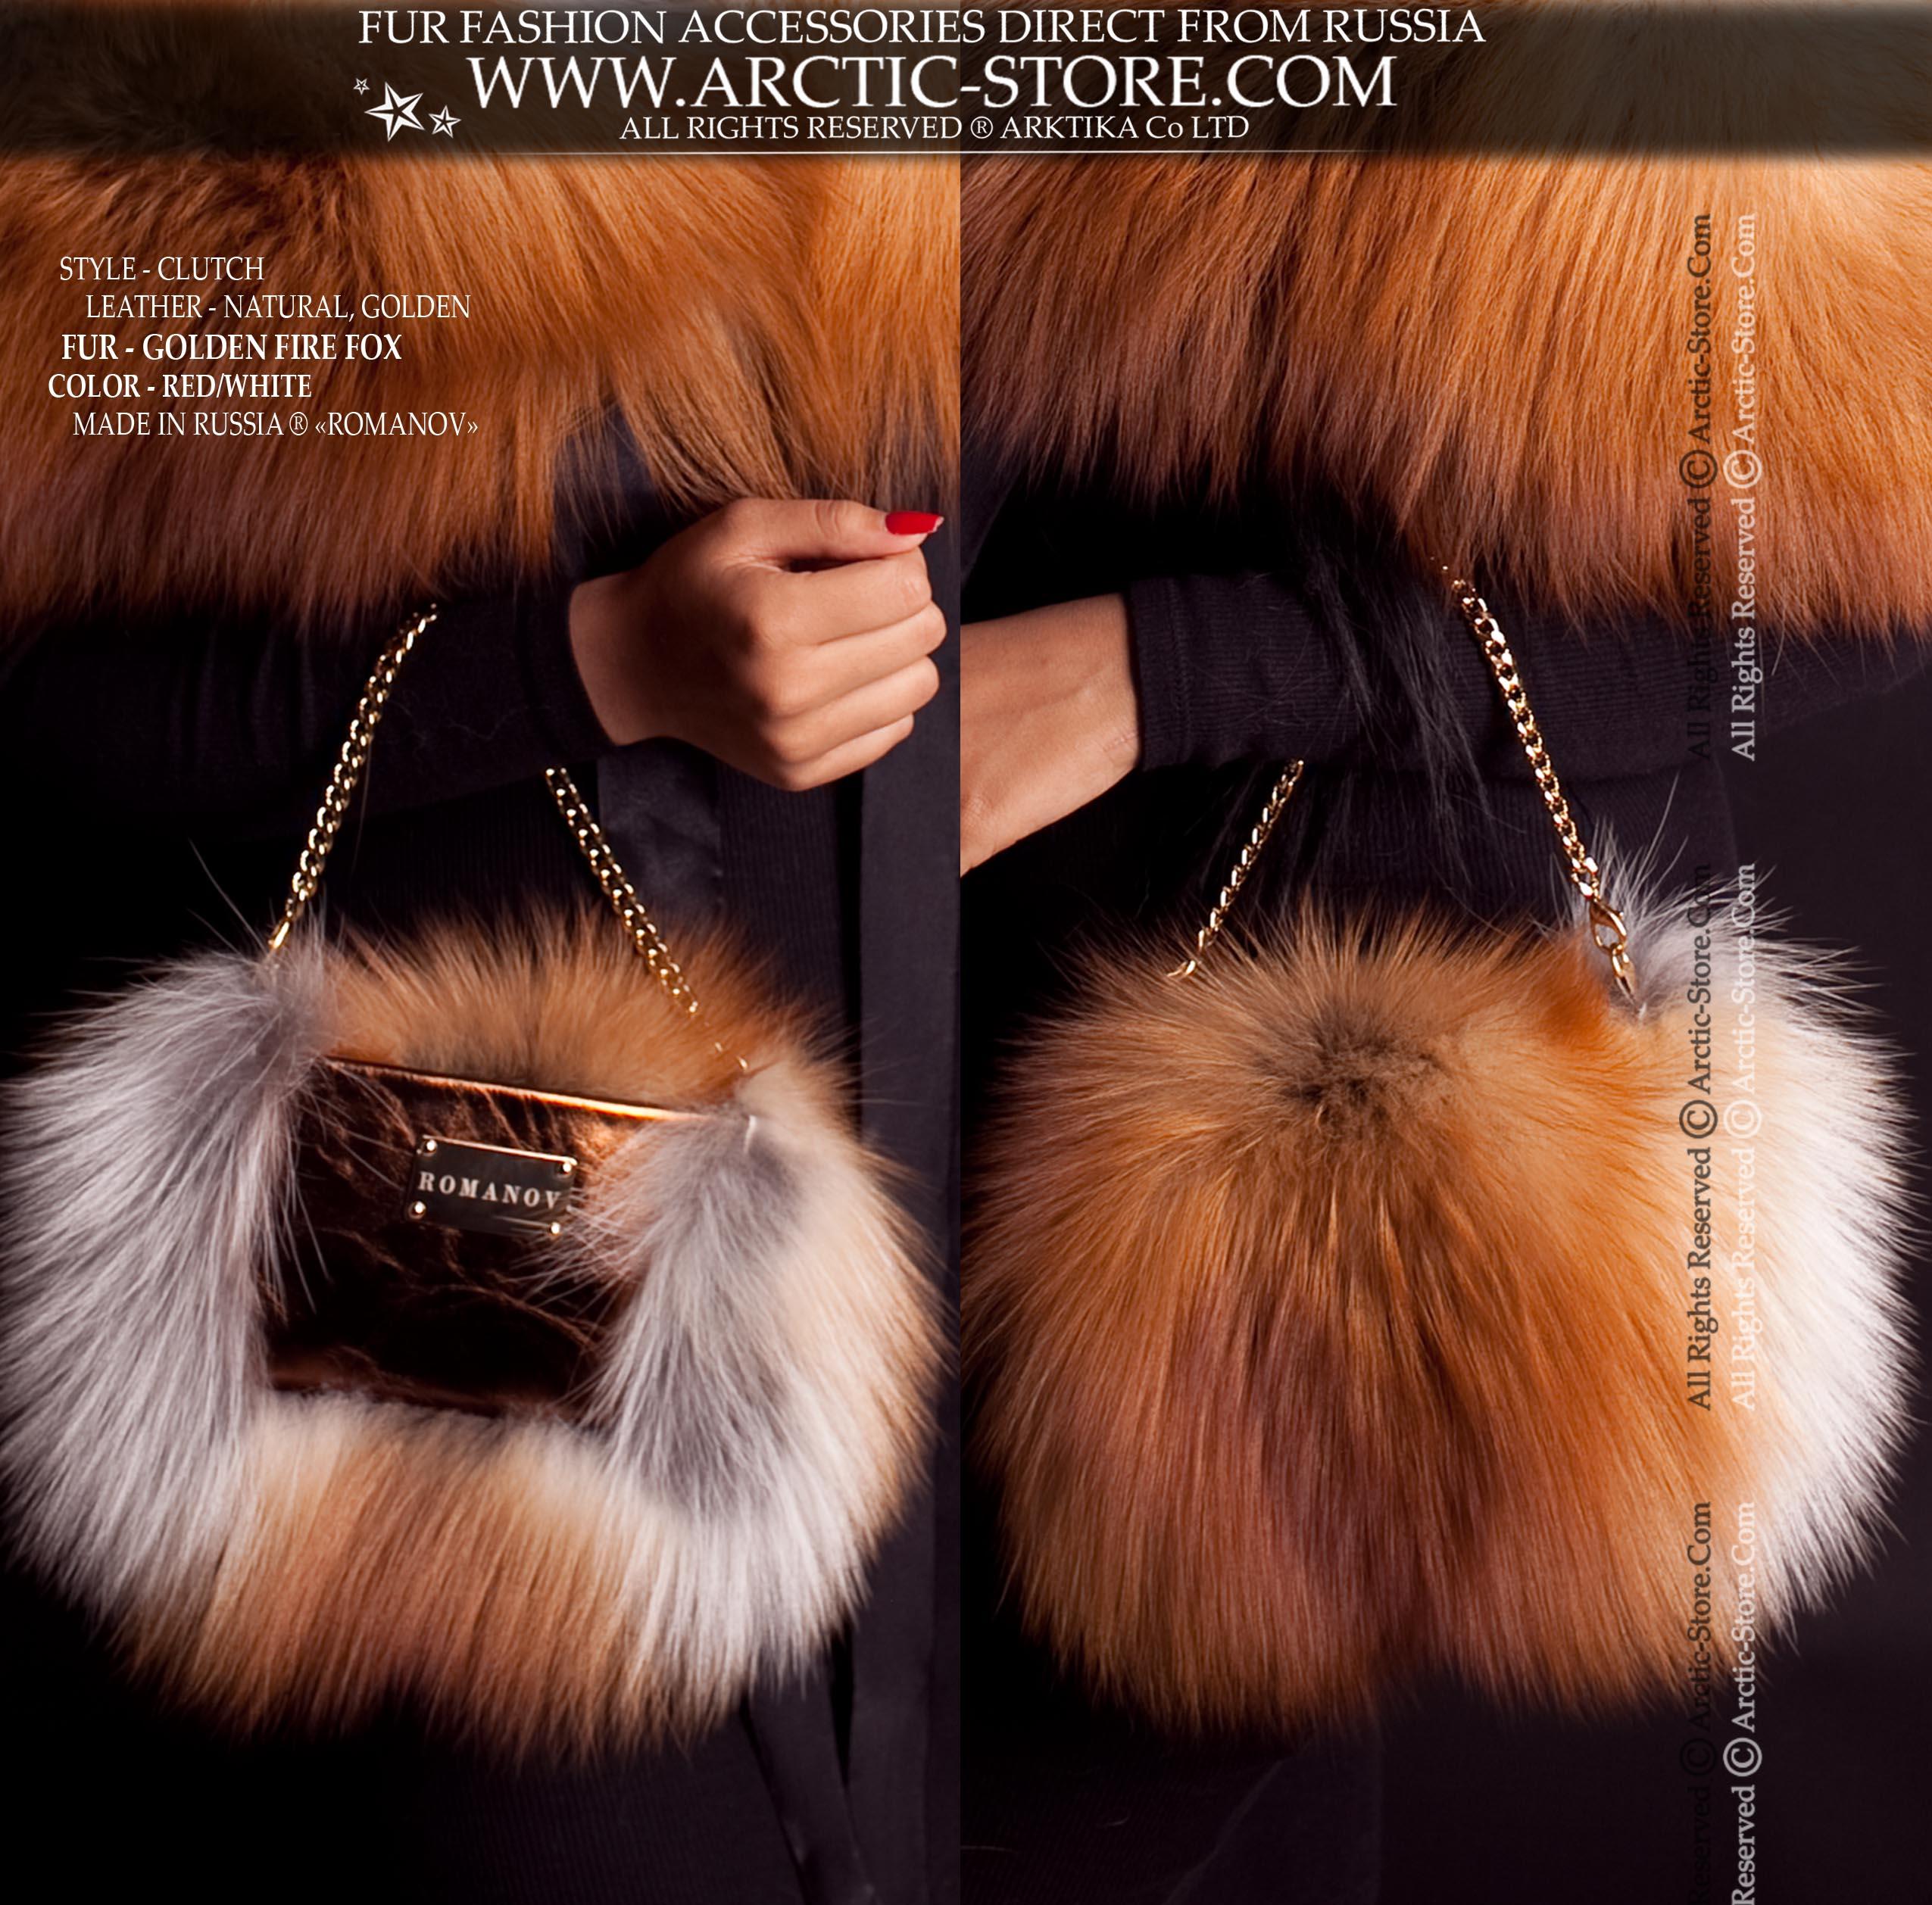 Buy Fur Clutch bags   Clutch Purses Online for Women at Arctic-Store 43848841900c